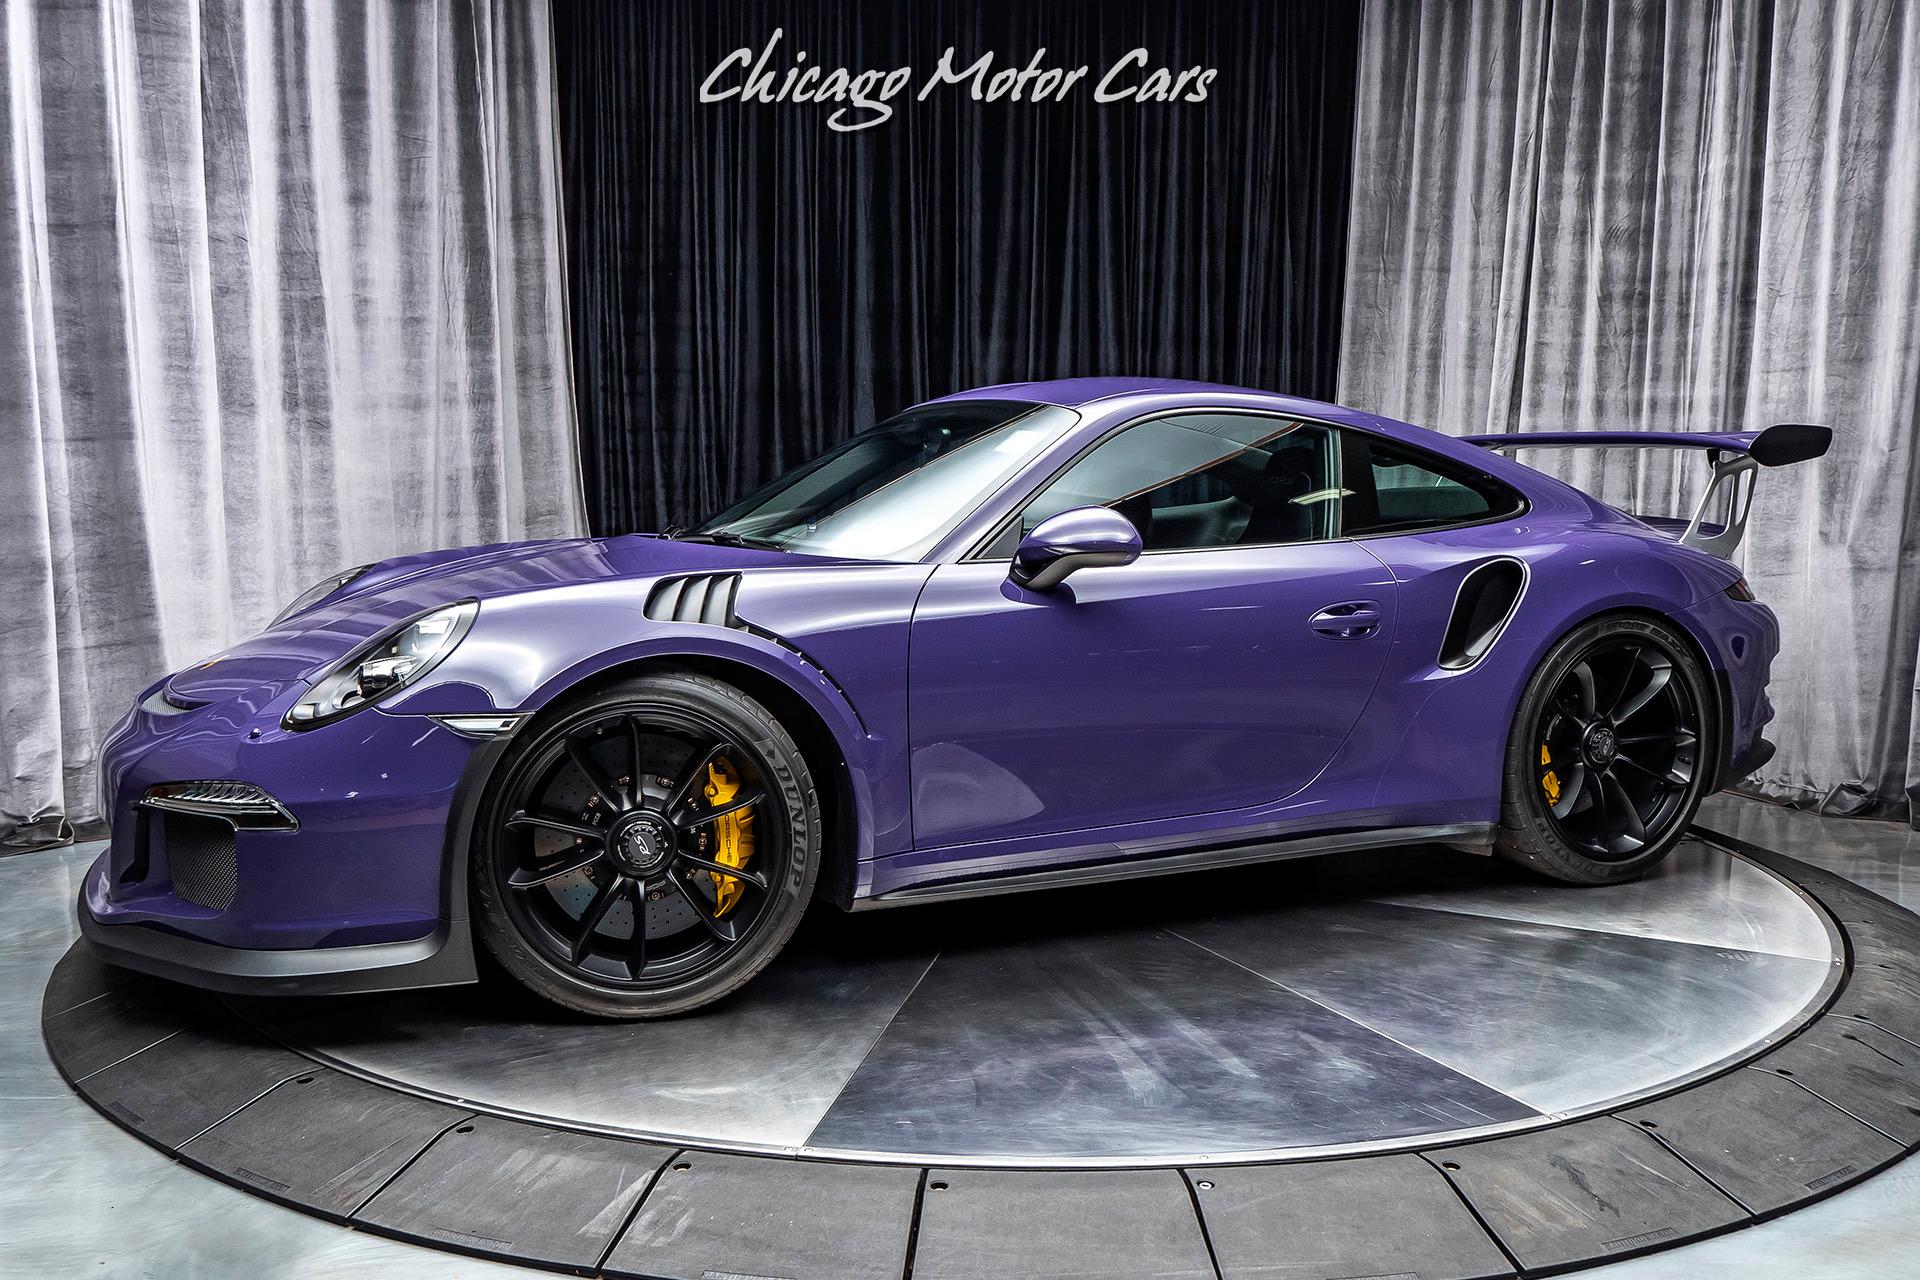 Used-2016-Porsche-911-GT3-RS-Coupe-ONLY-6K-MILES-PORSCHE-CERAMIC-COMPOSITE-BRAKES